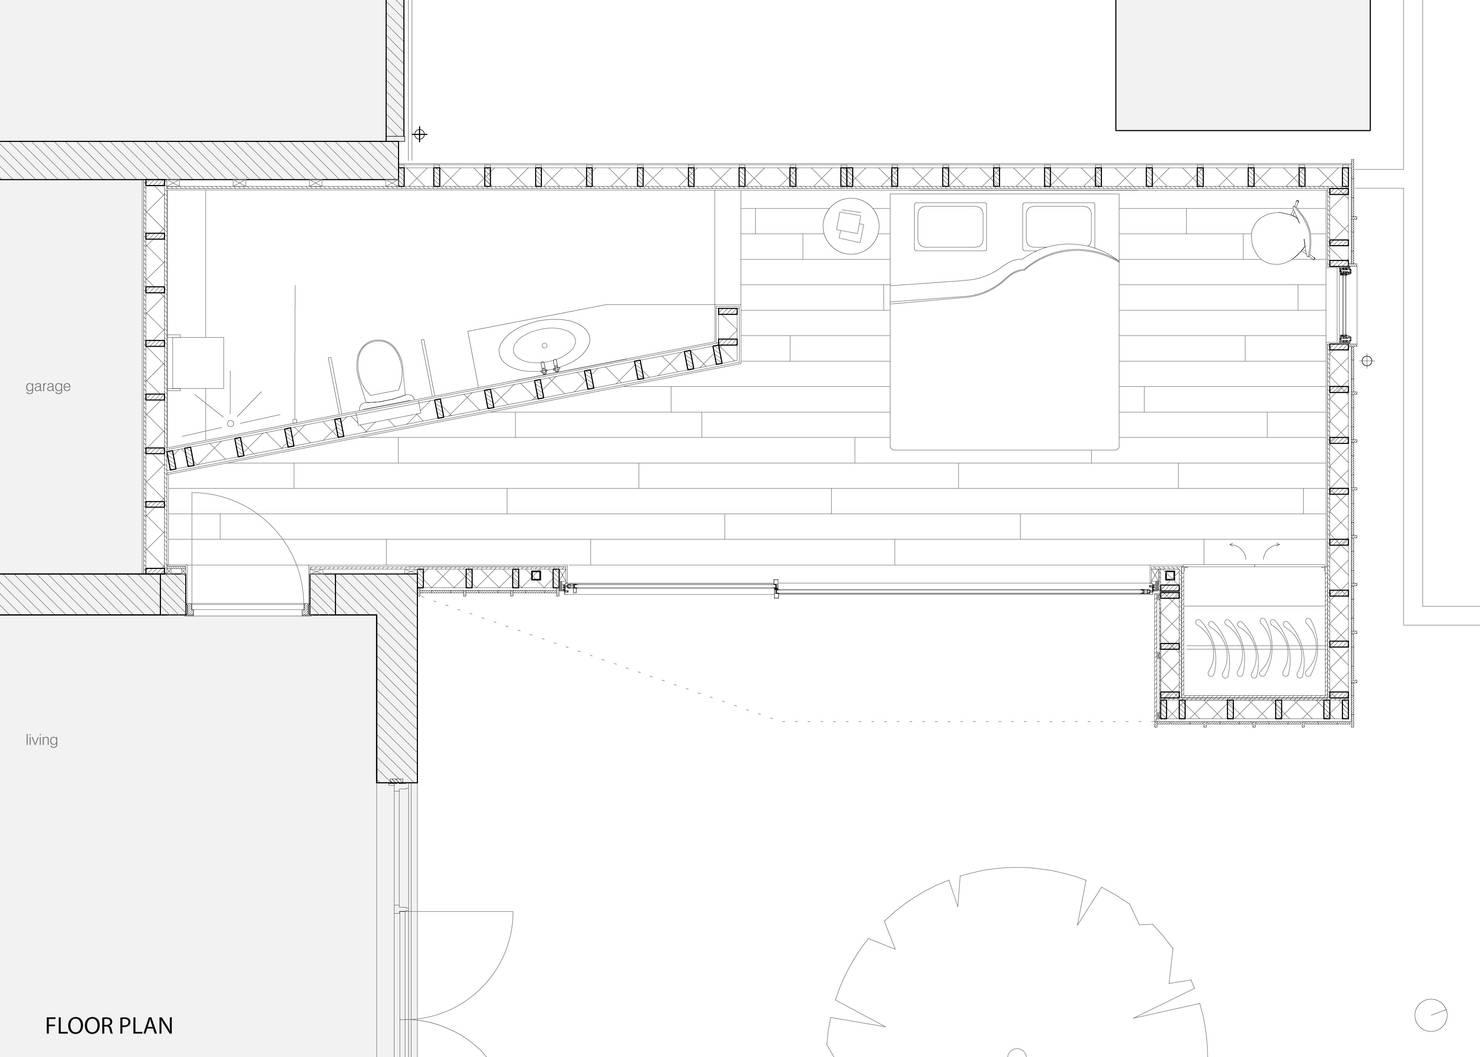 Строительство пристройки шаг за шагом + планировка